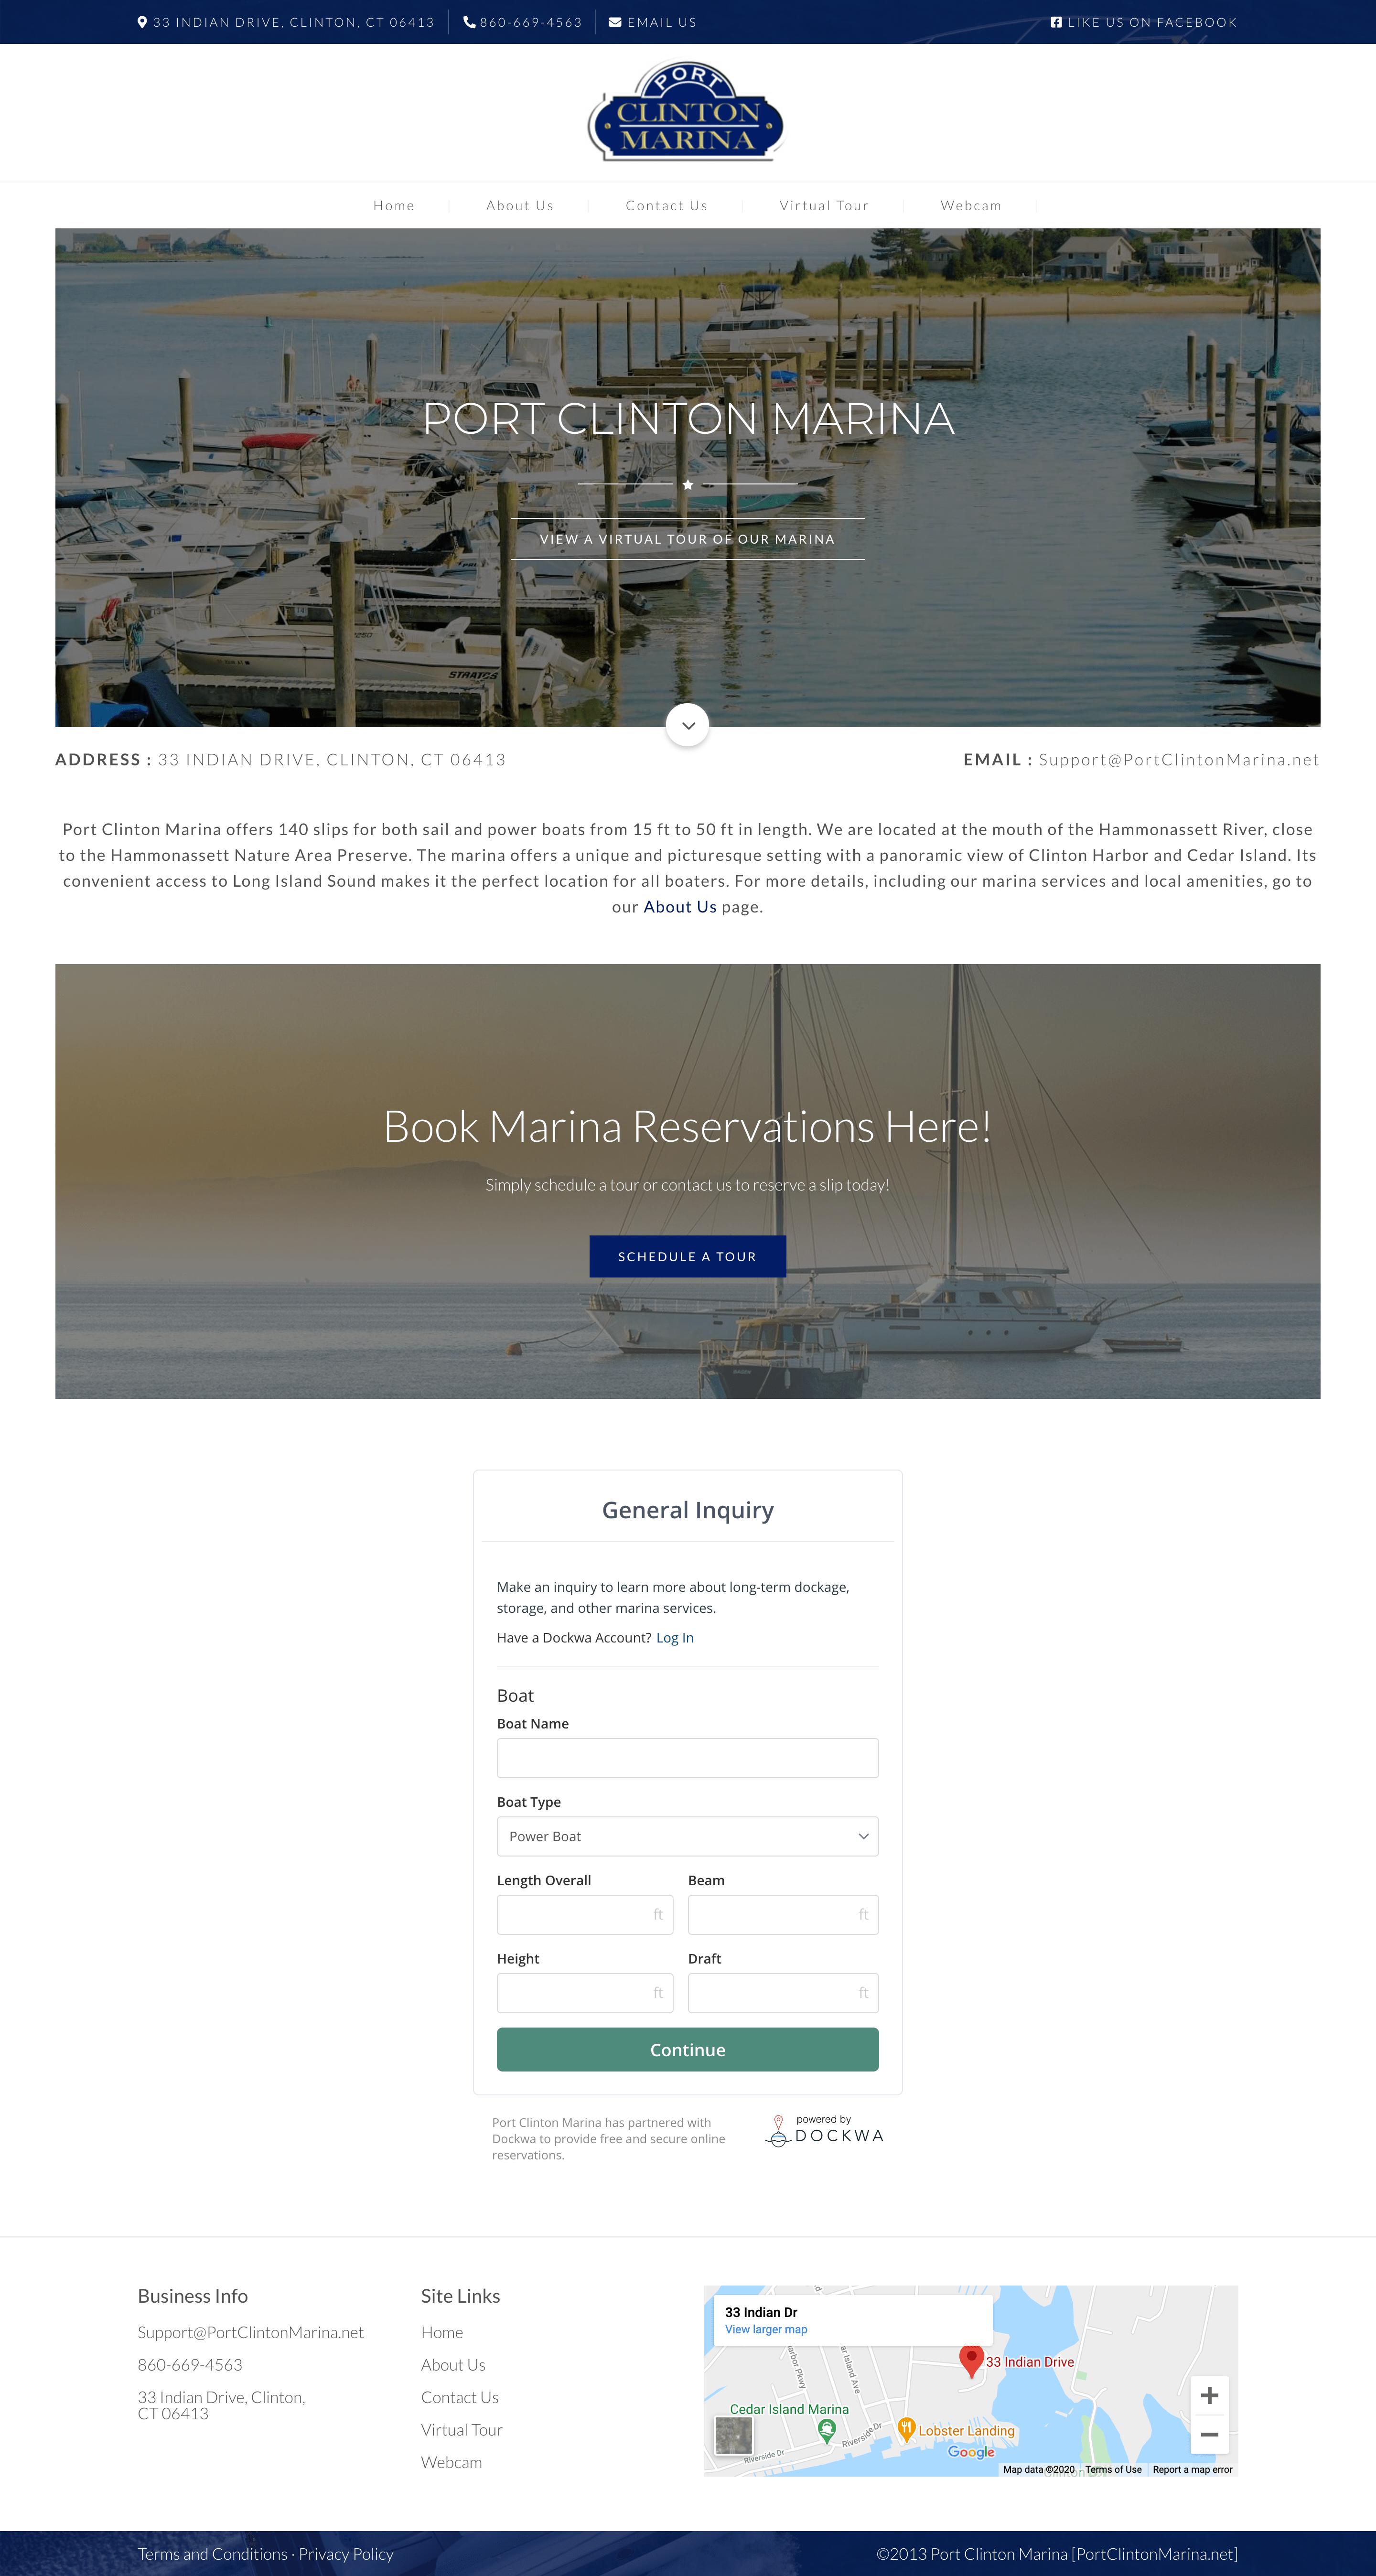 Port Clinton Marina - Full Website Layout Design - Homepage